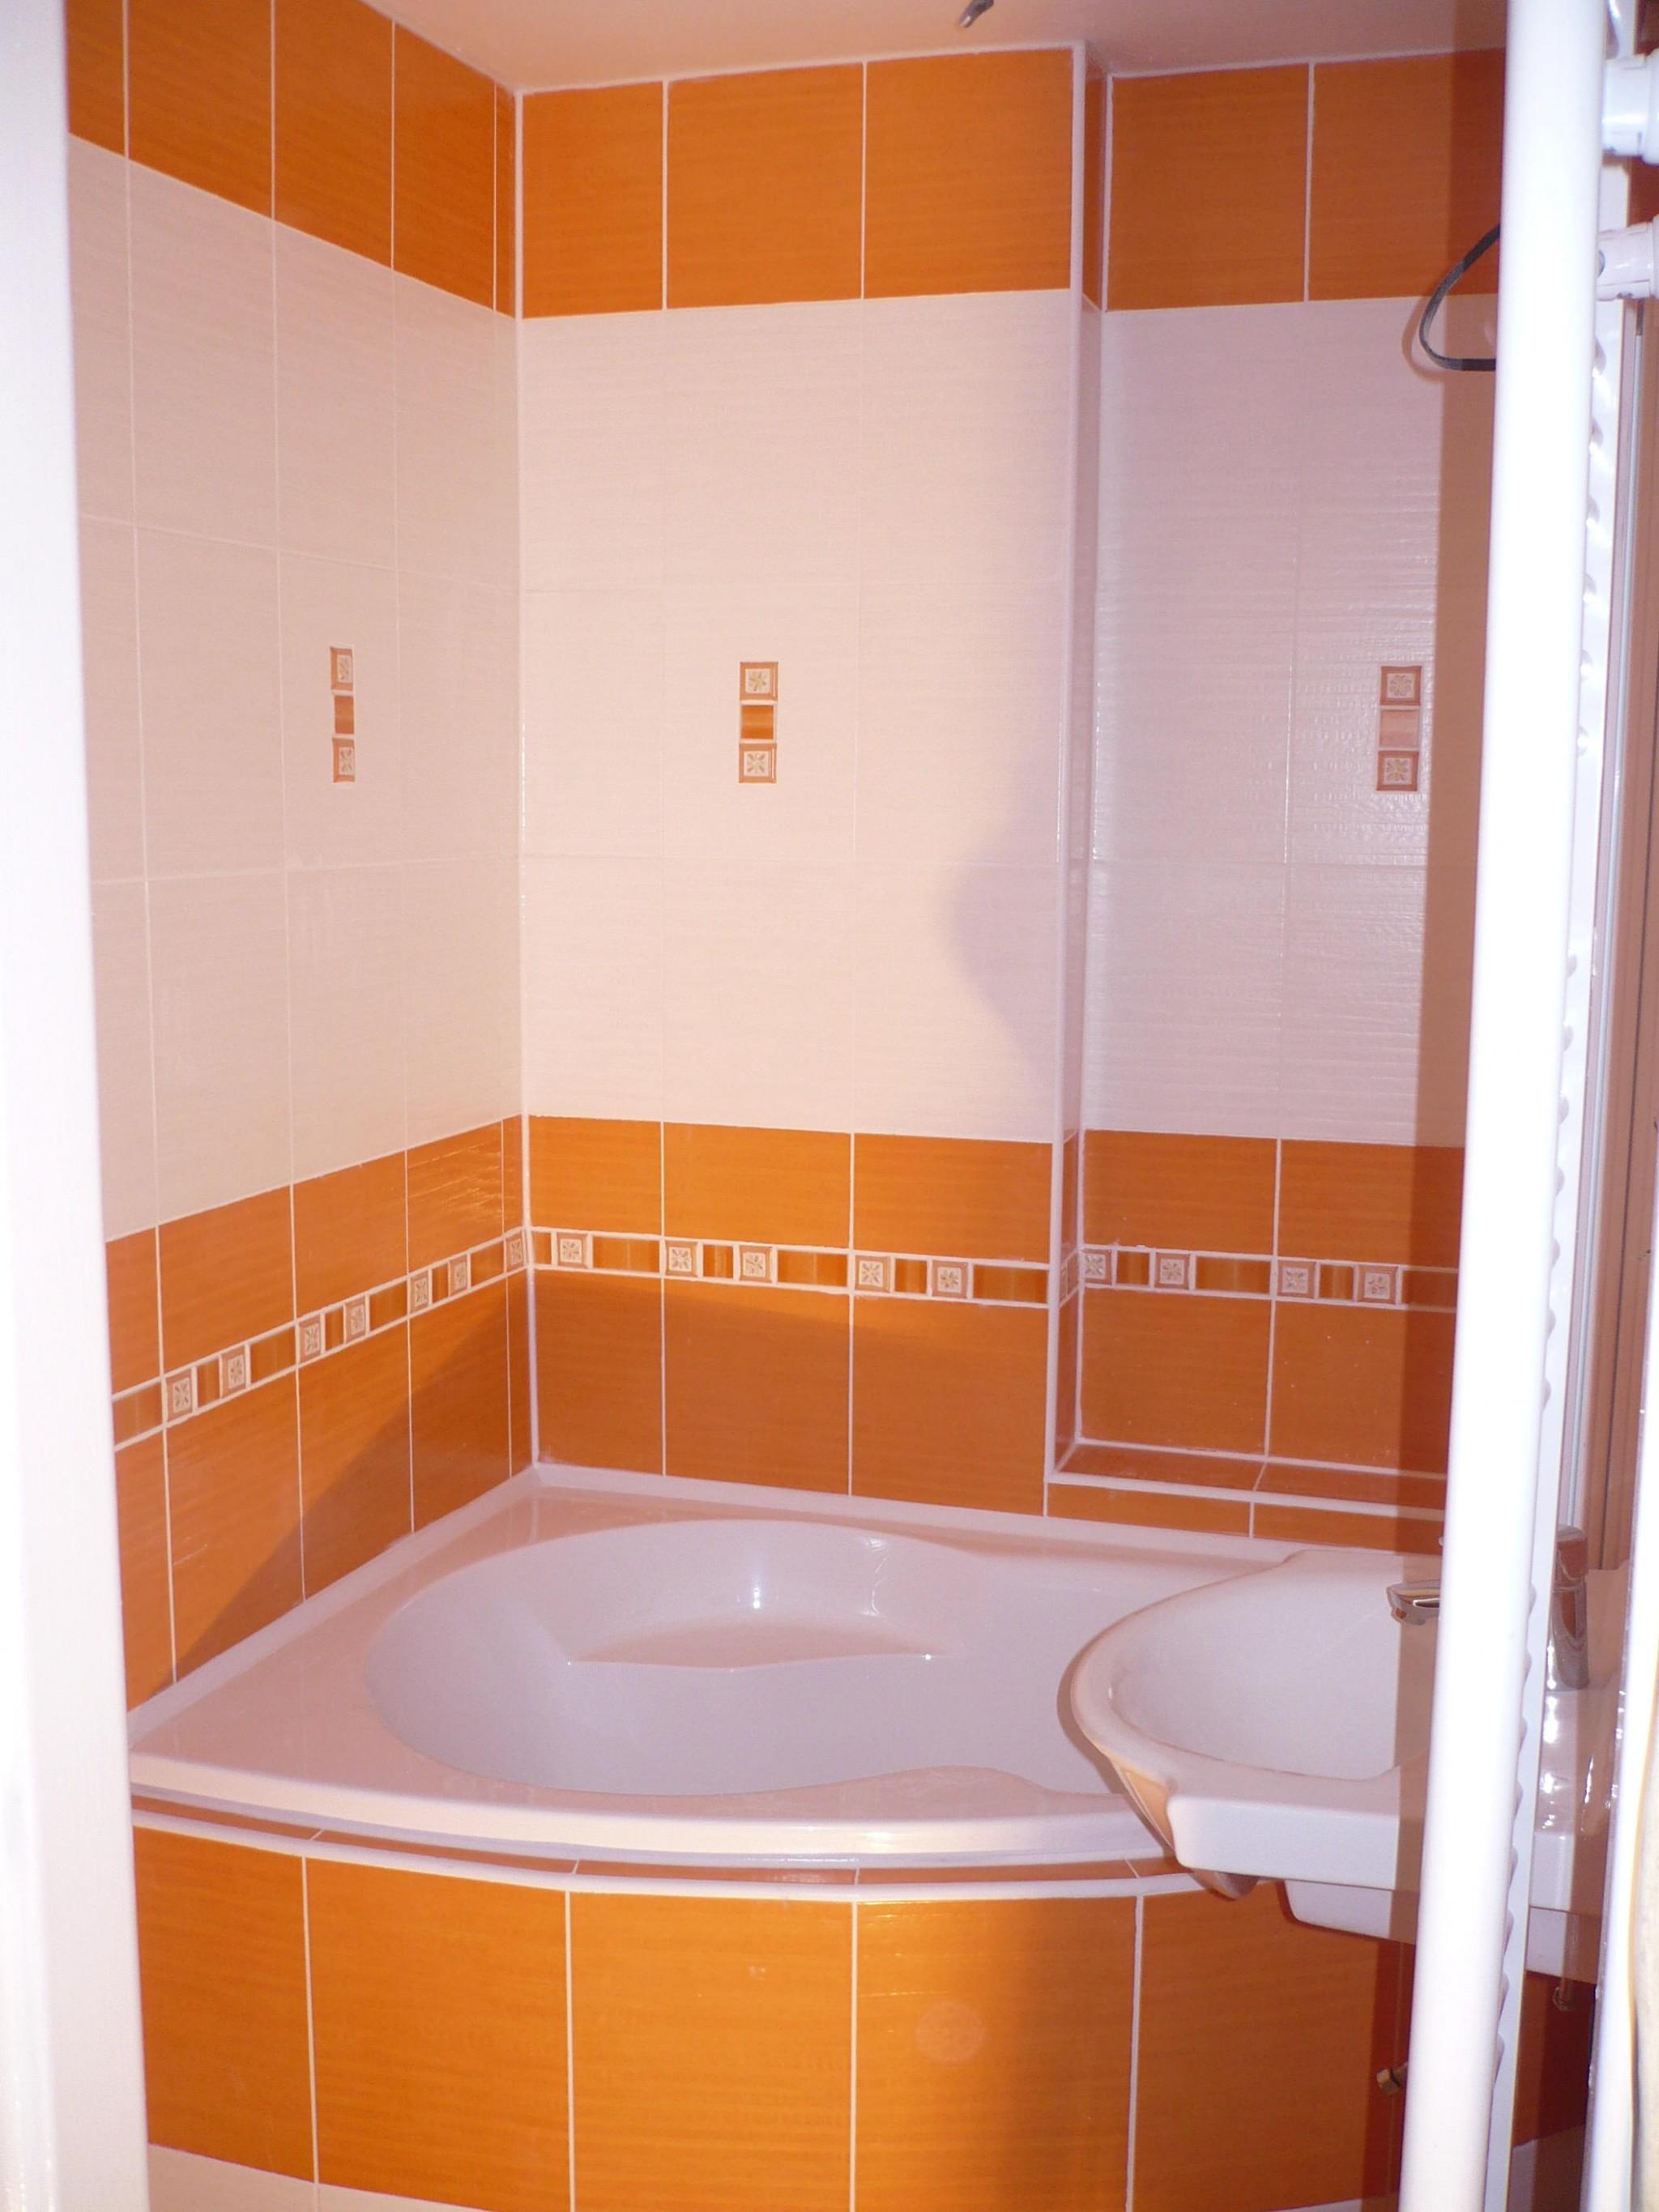 Koupelny Galerie